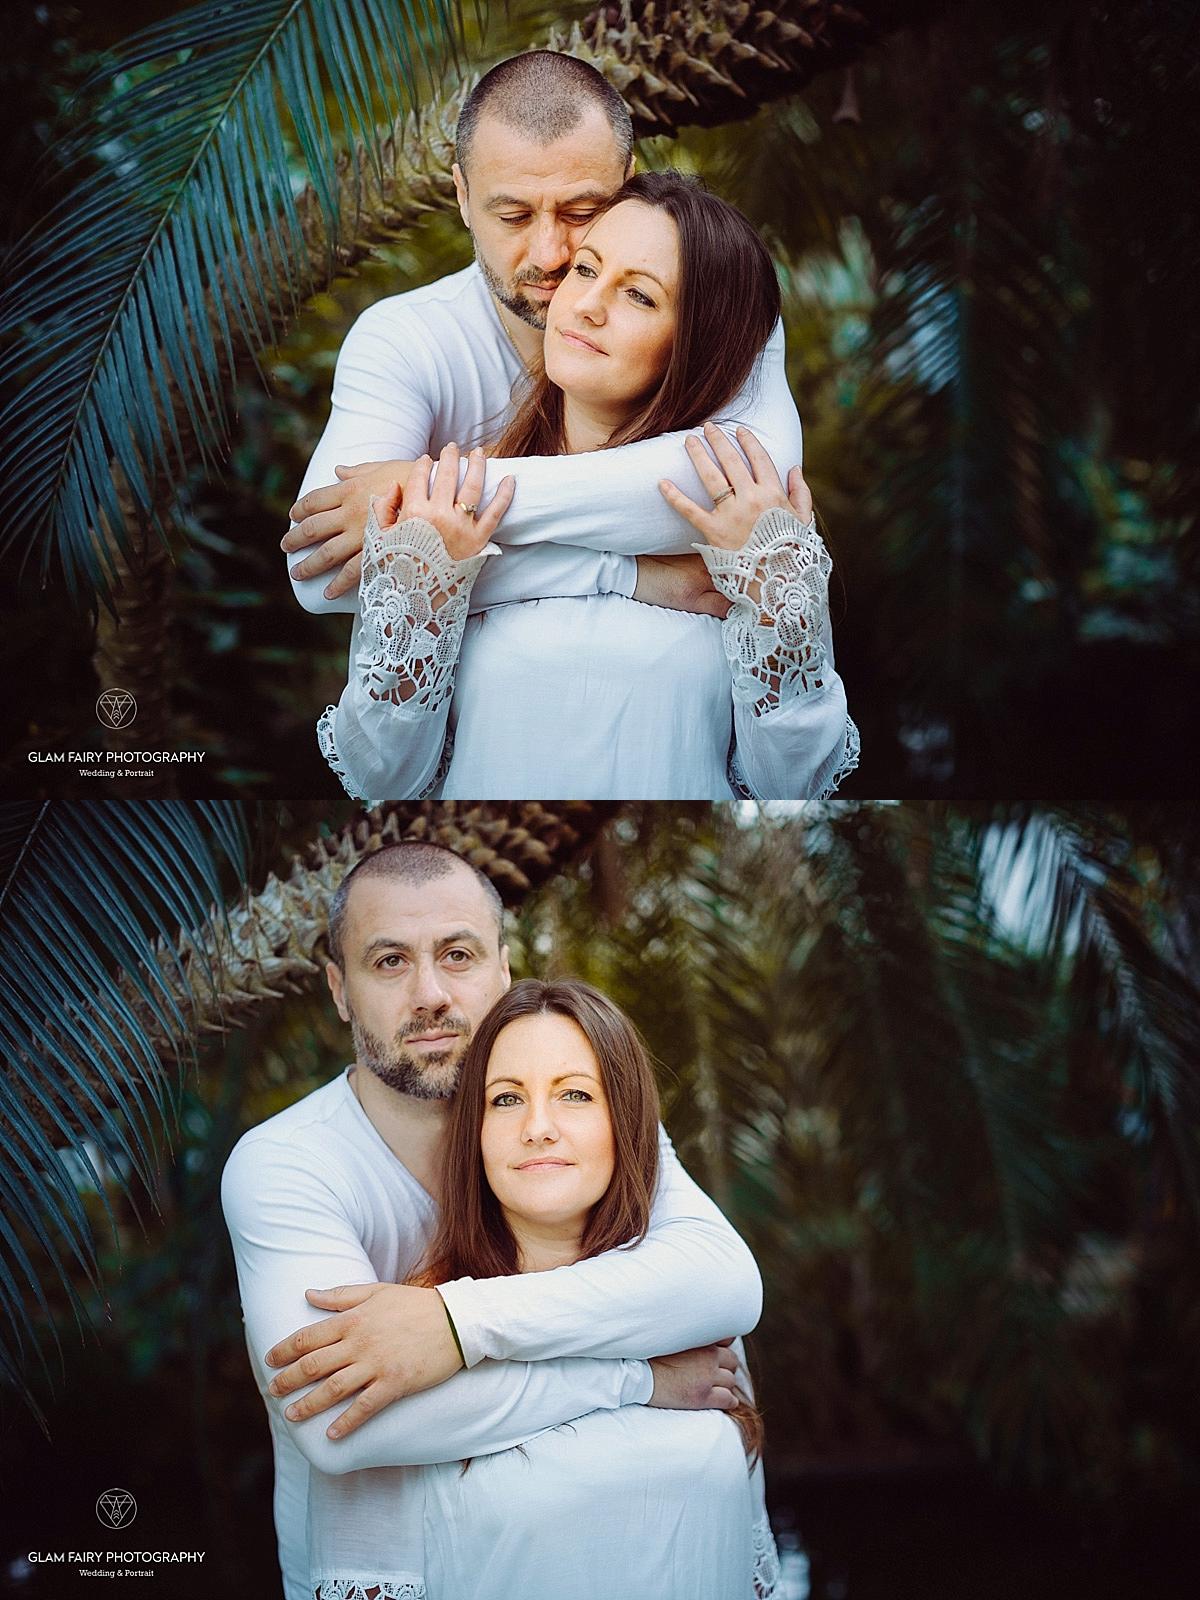 GlamFairyPhotography-seance-couple-famille-serres-auteuil-sonia_0009